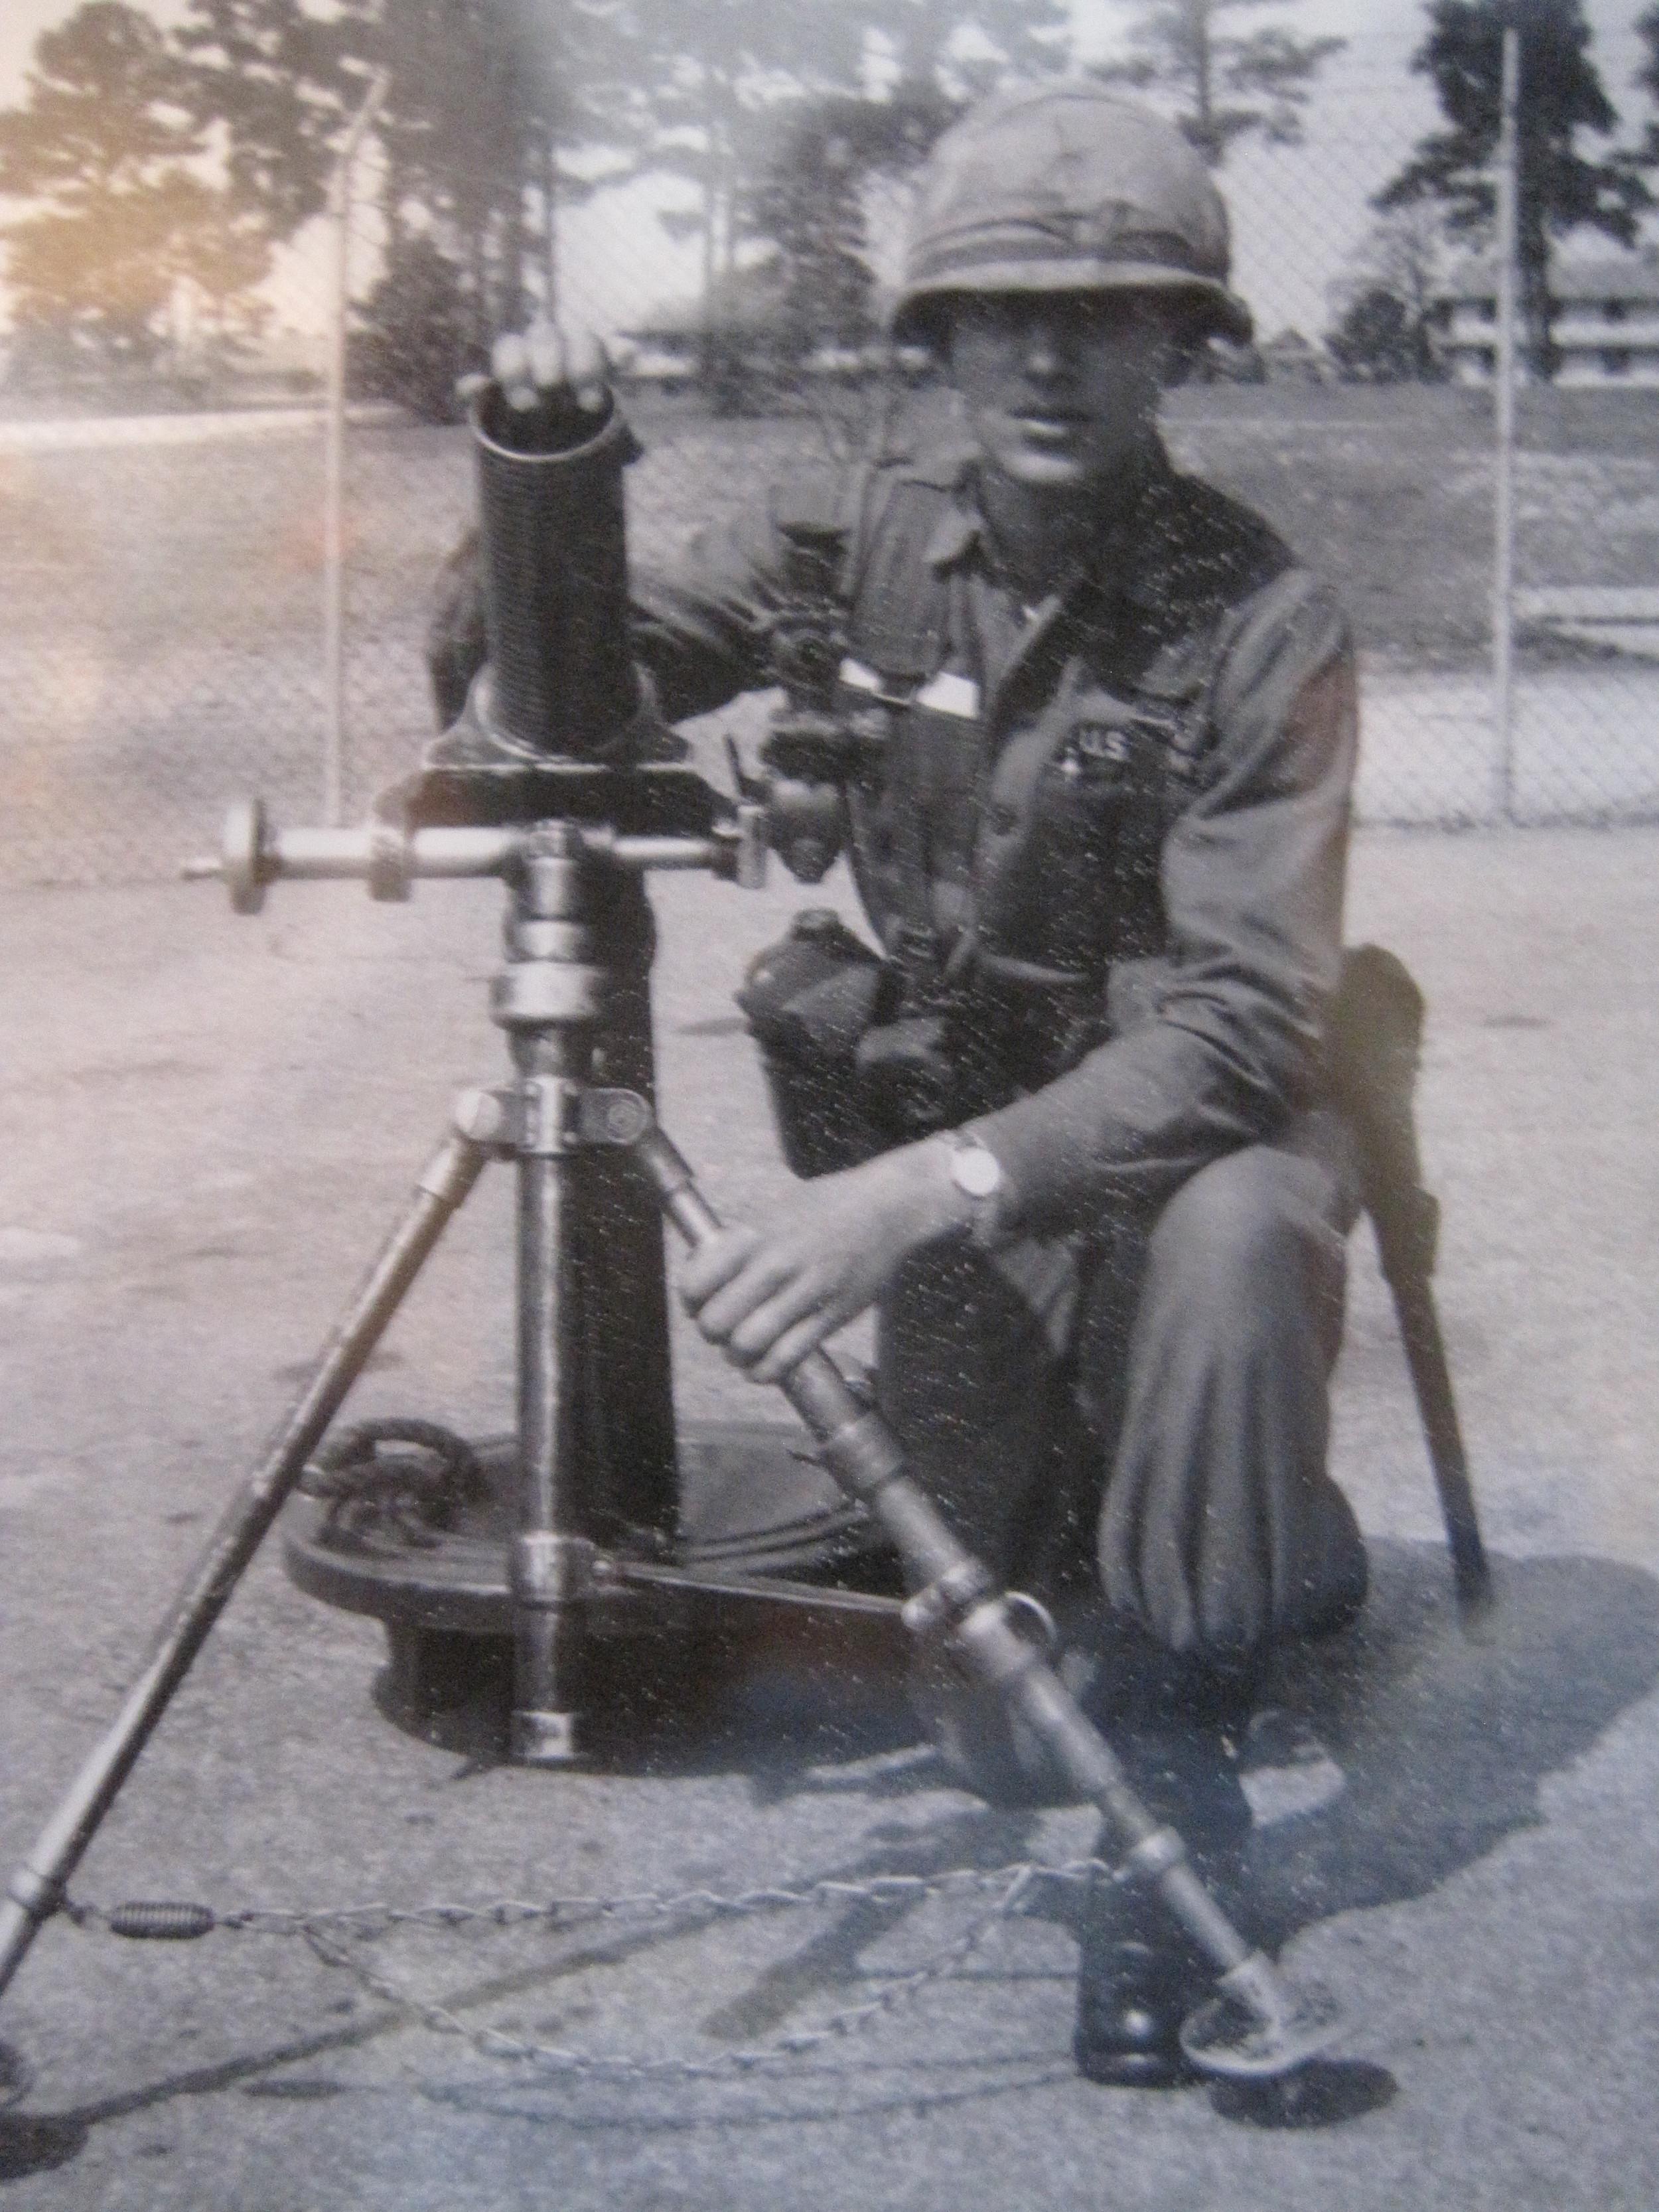 Private Robert Ankony